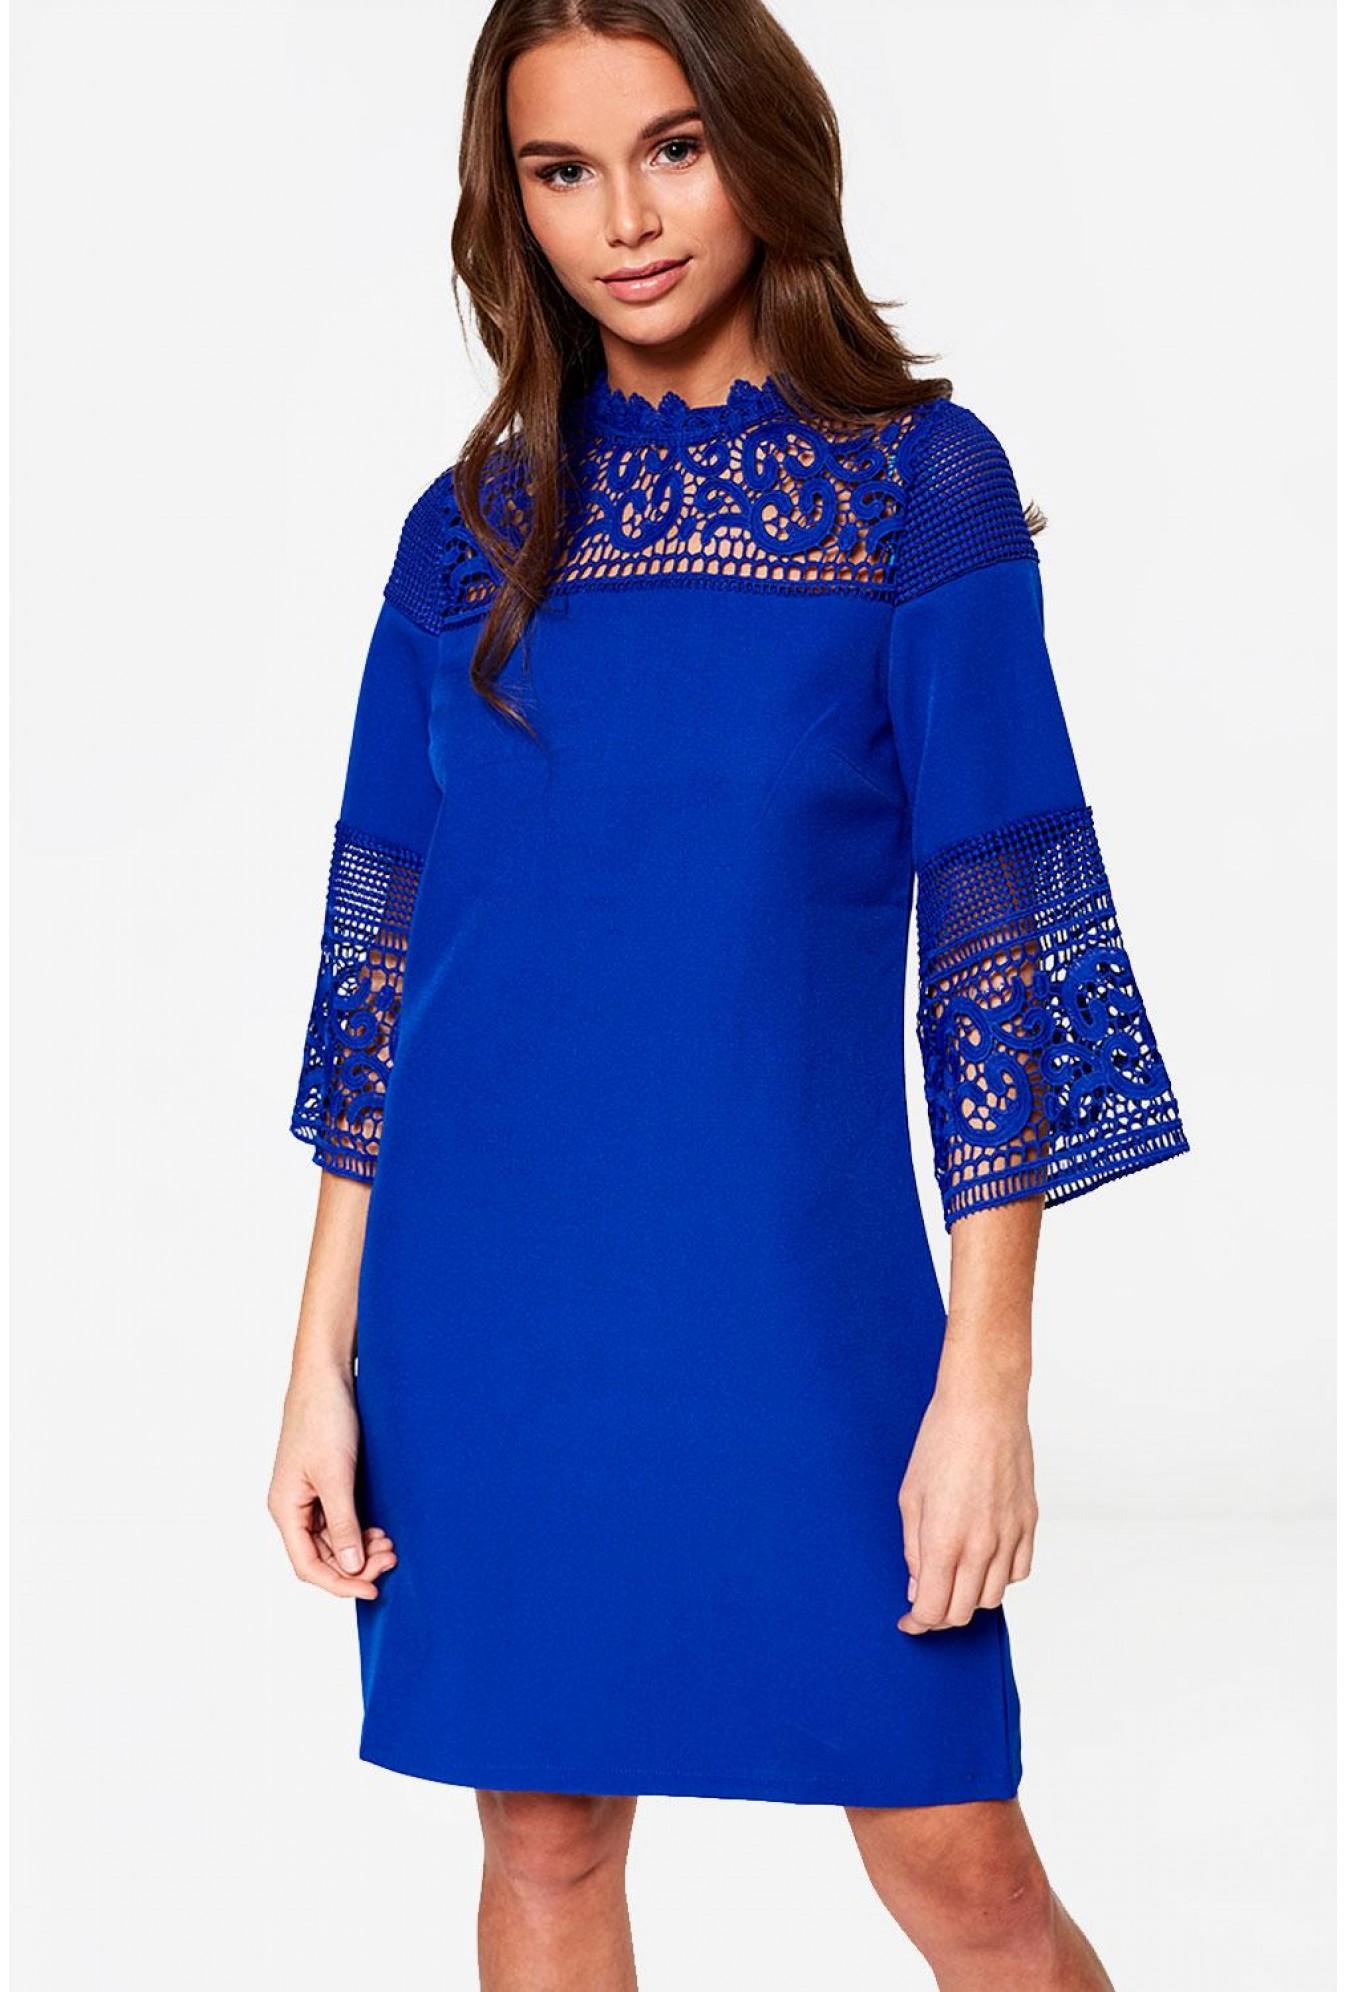 2b71ca87e341e1 Marc Angelo Joyce 3/4 Sleeve Lace Dress in Royal Blue | iCLOTHING